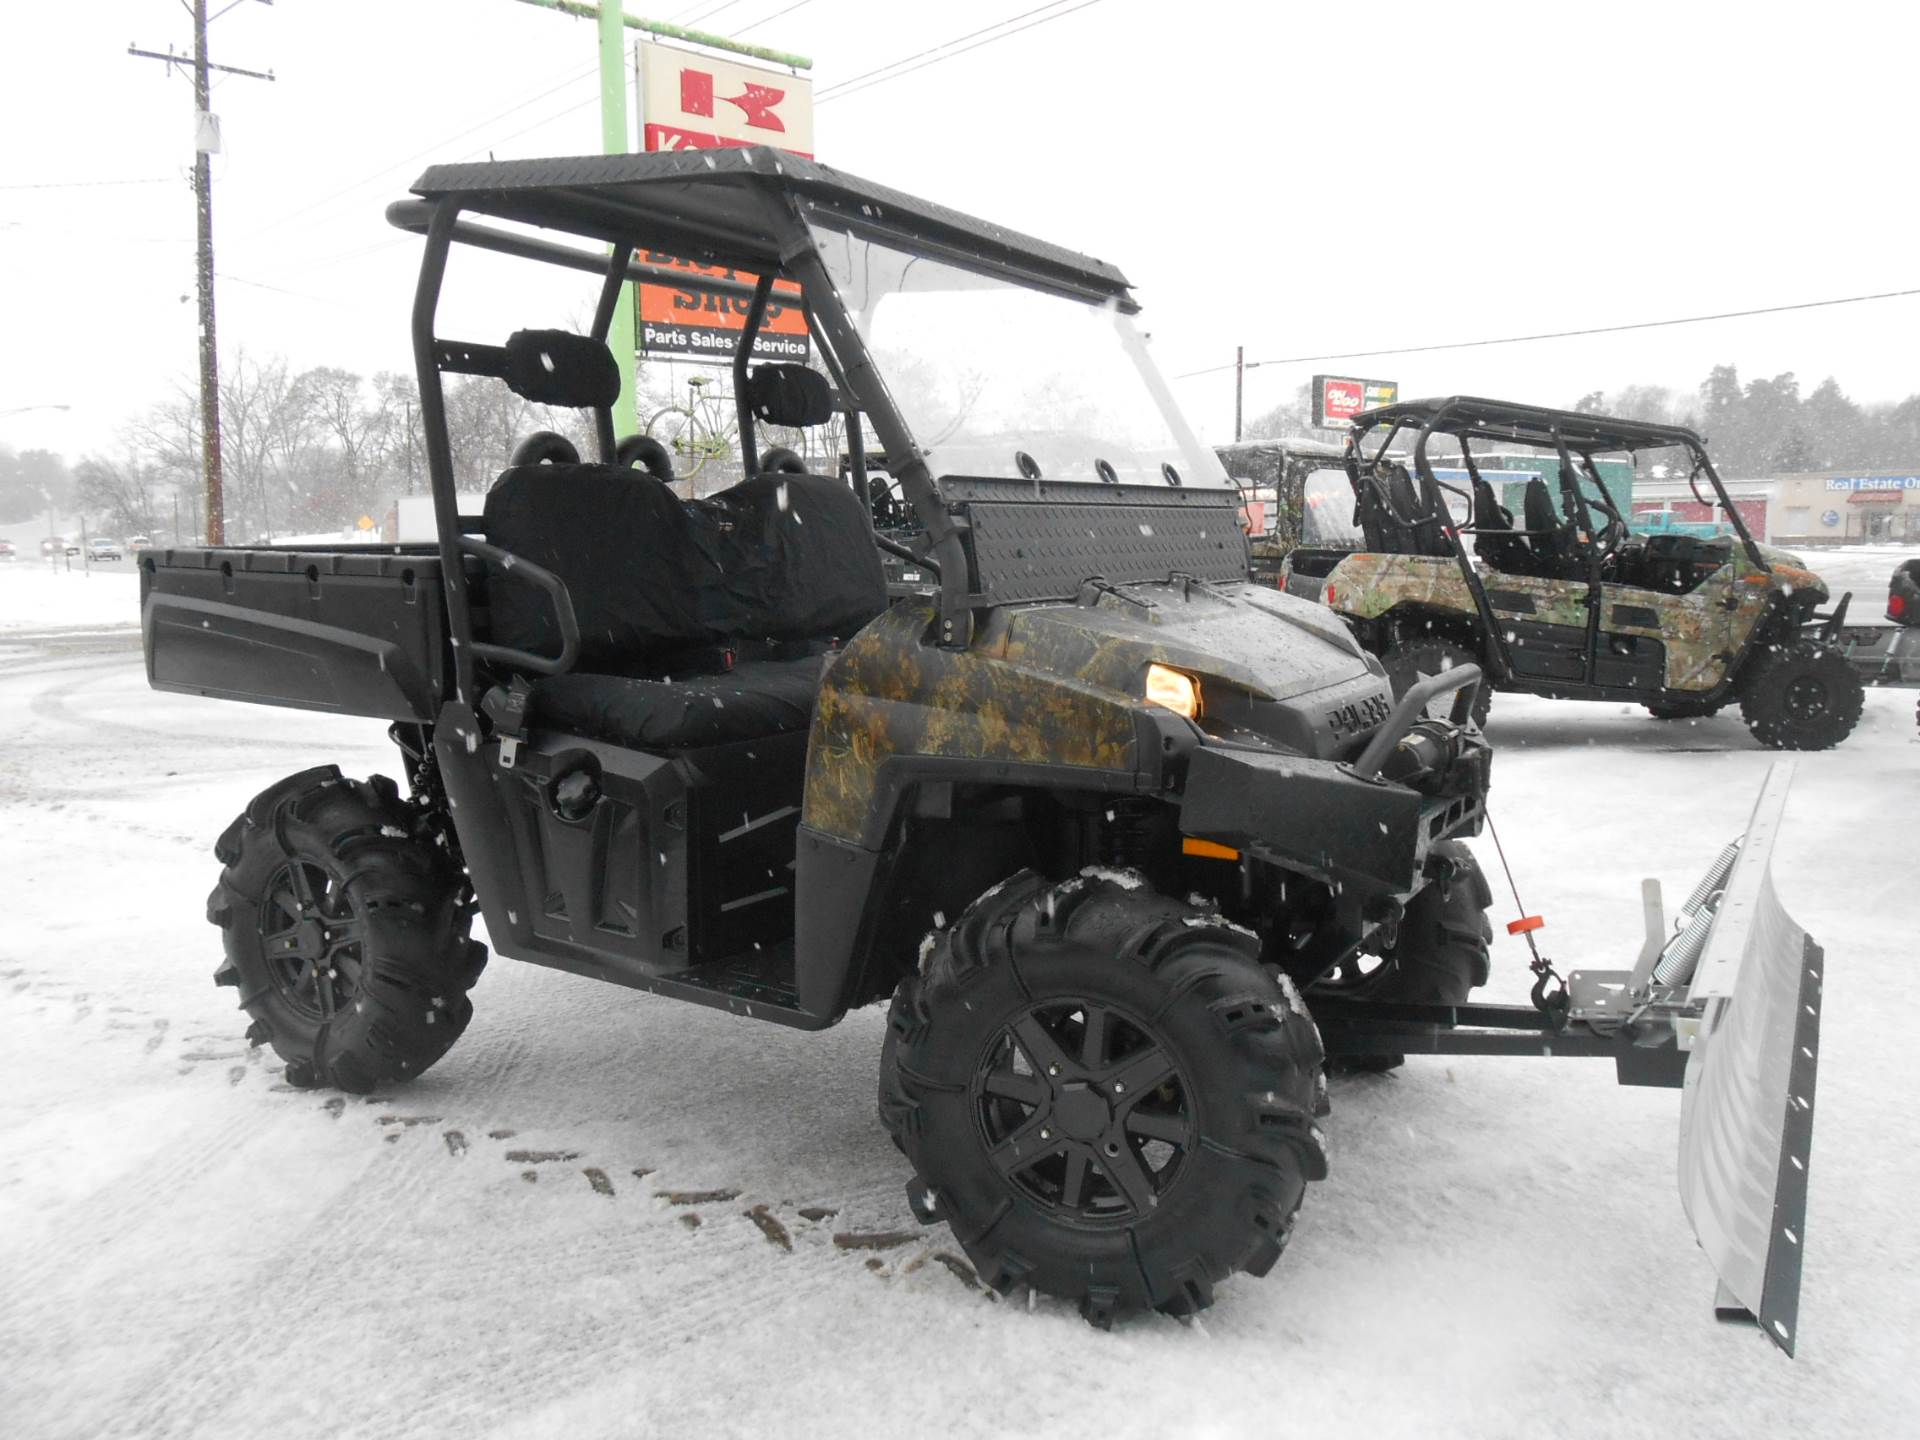 2009 Ranger XP